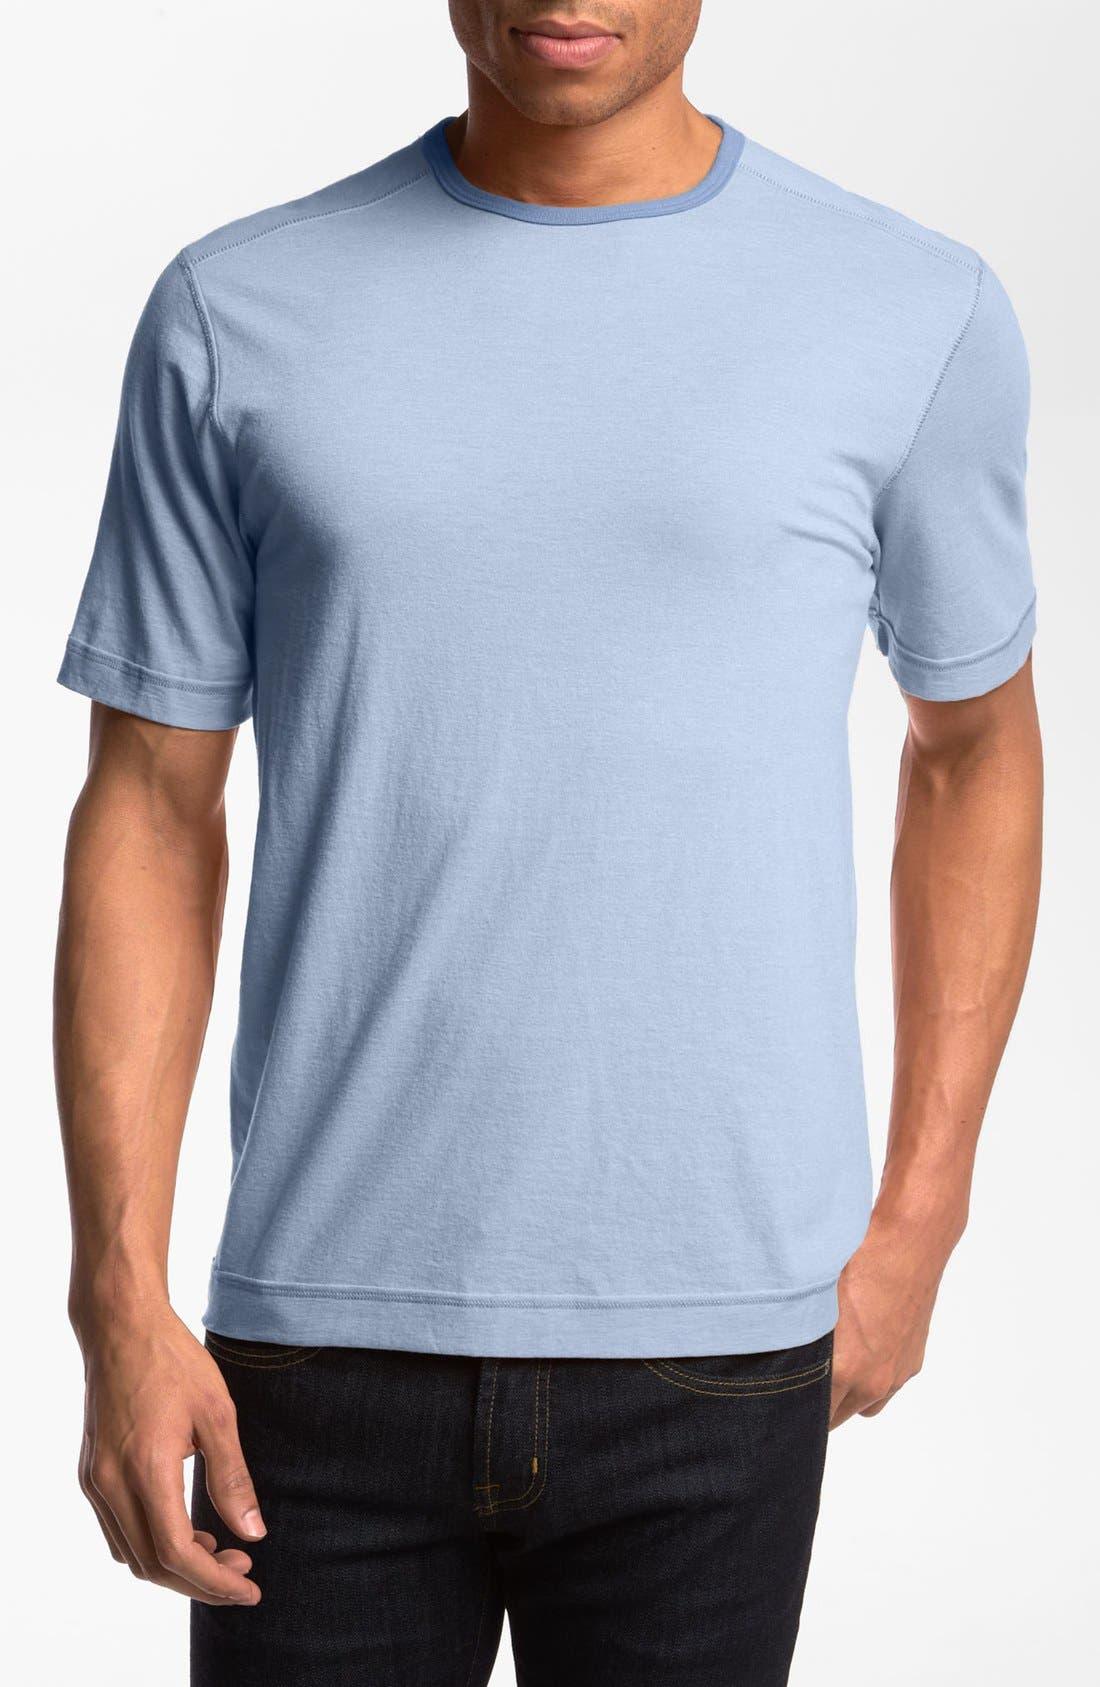 Alternate Image 1 Selected - Tommy Bahama Denim 'Porta Ringer' Island Modern Fit T-Shirt